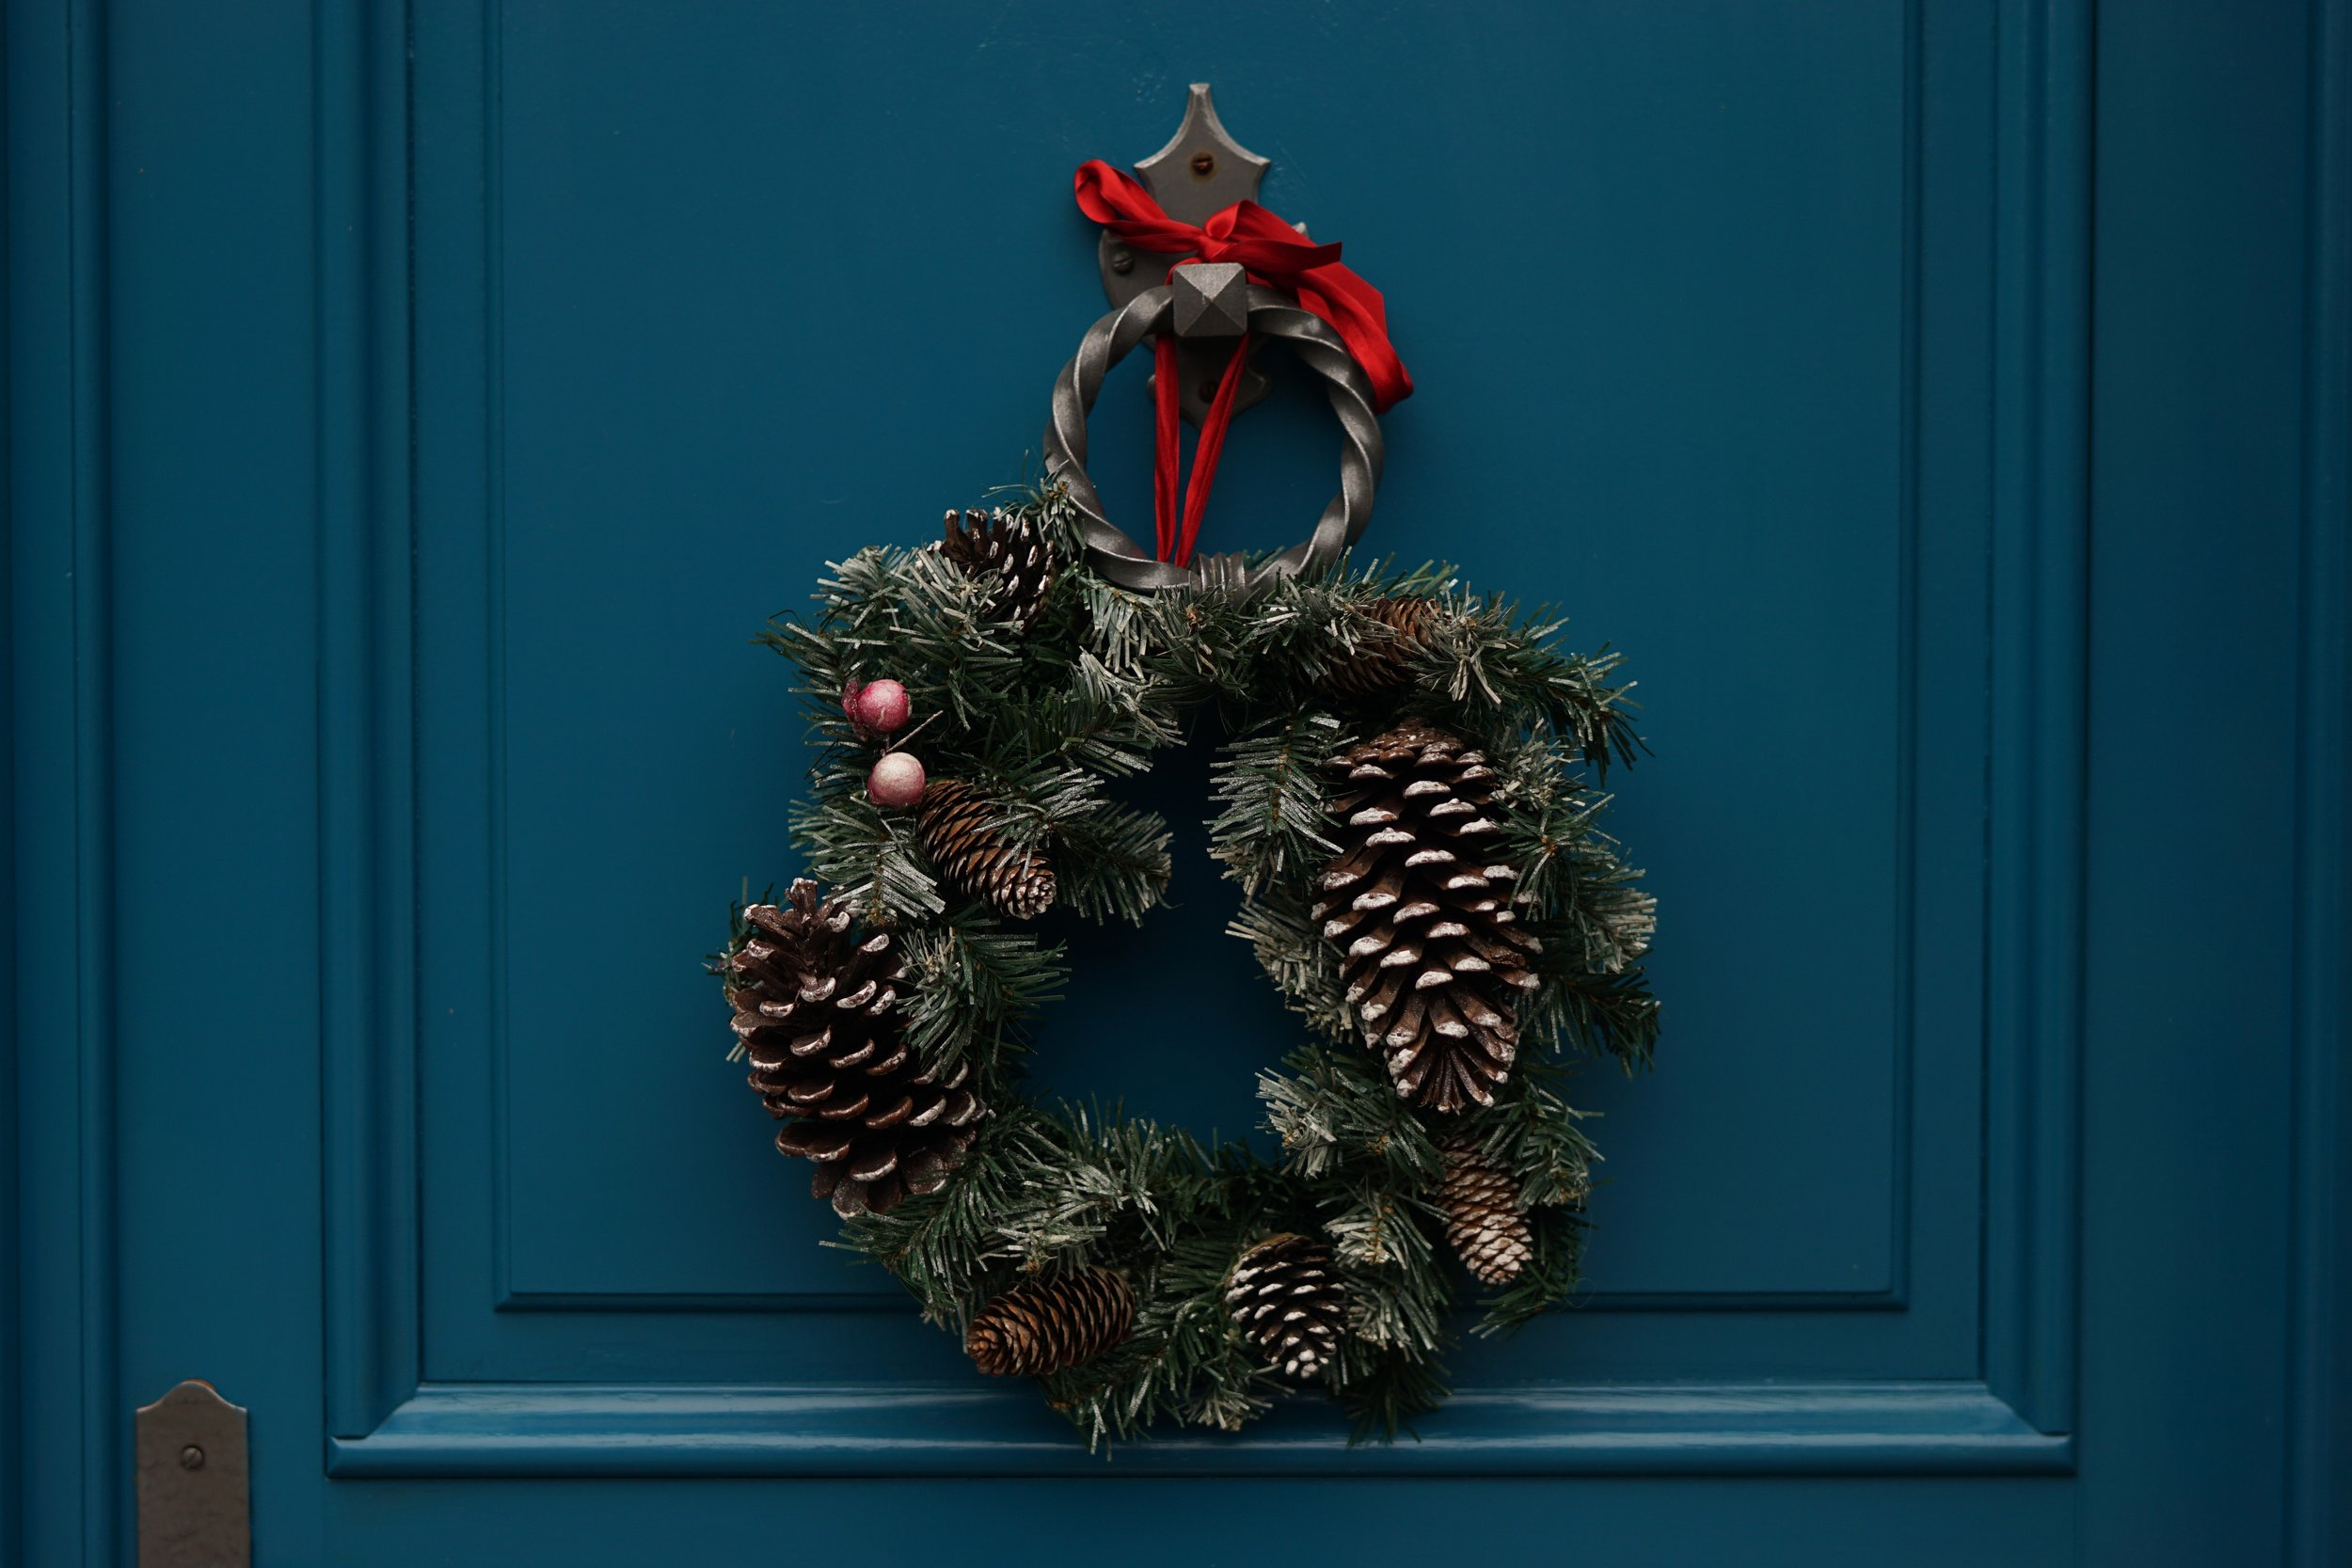 wreath on blue door erwan-hesry-171450-unsplash.jpg